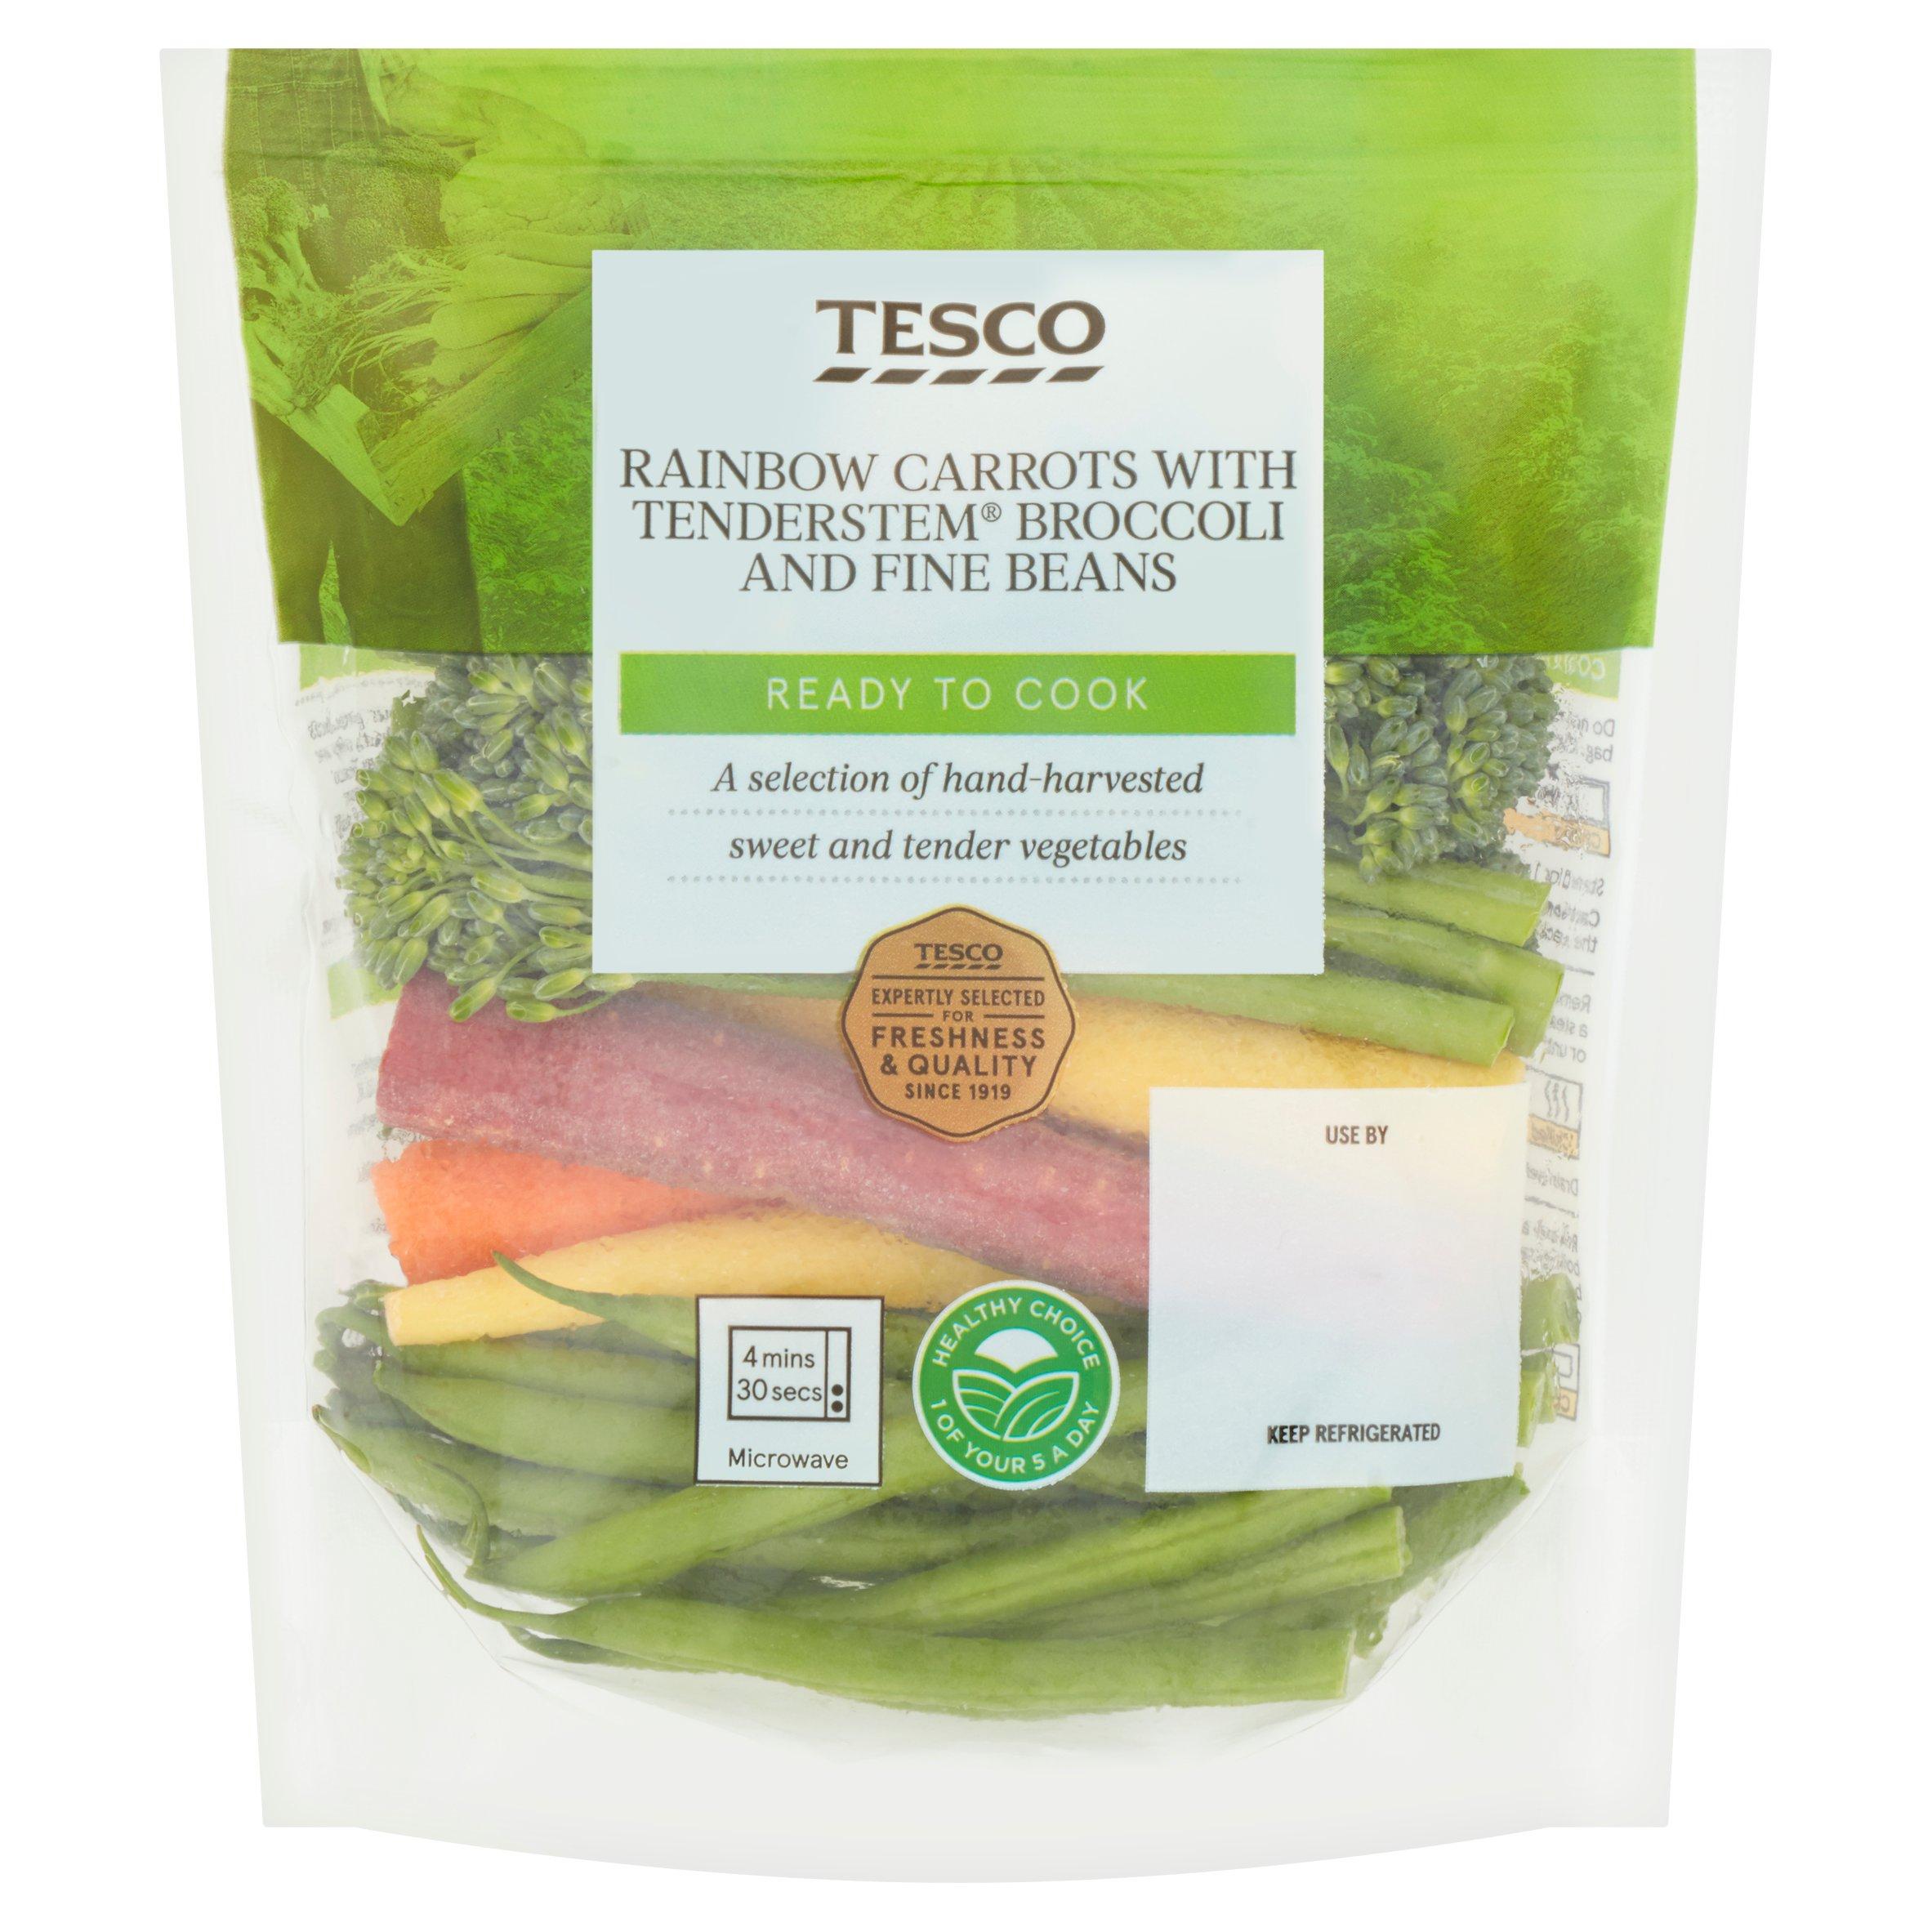 Tesco Rainbow Carrots With Tenderstem Broccoli, Fine Beans 180G